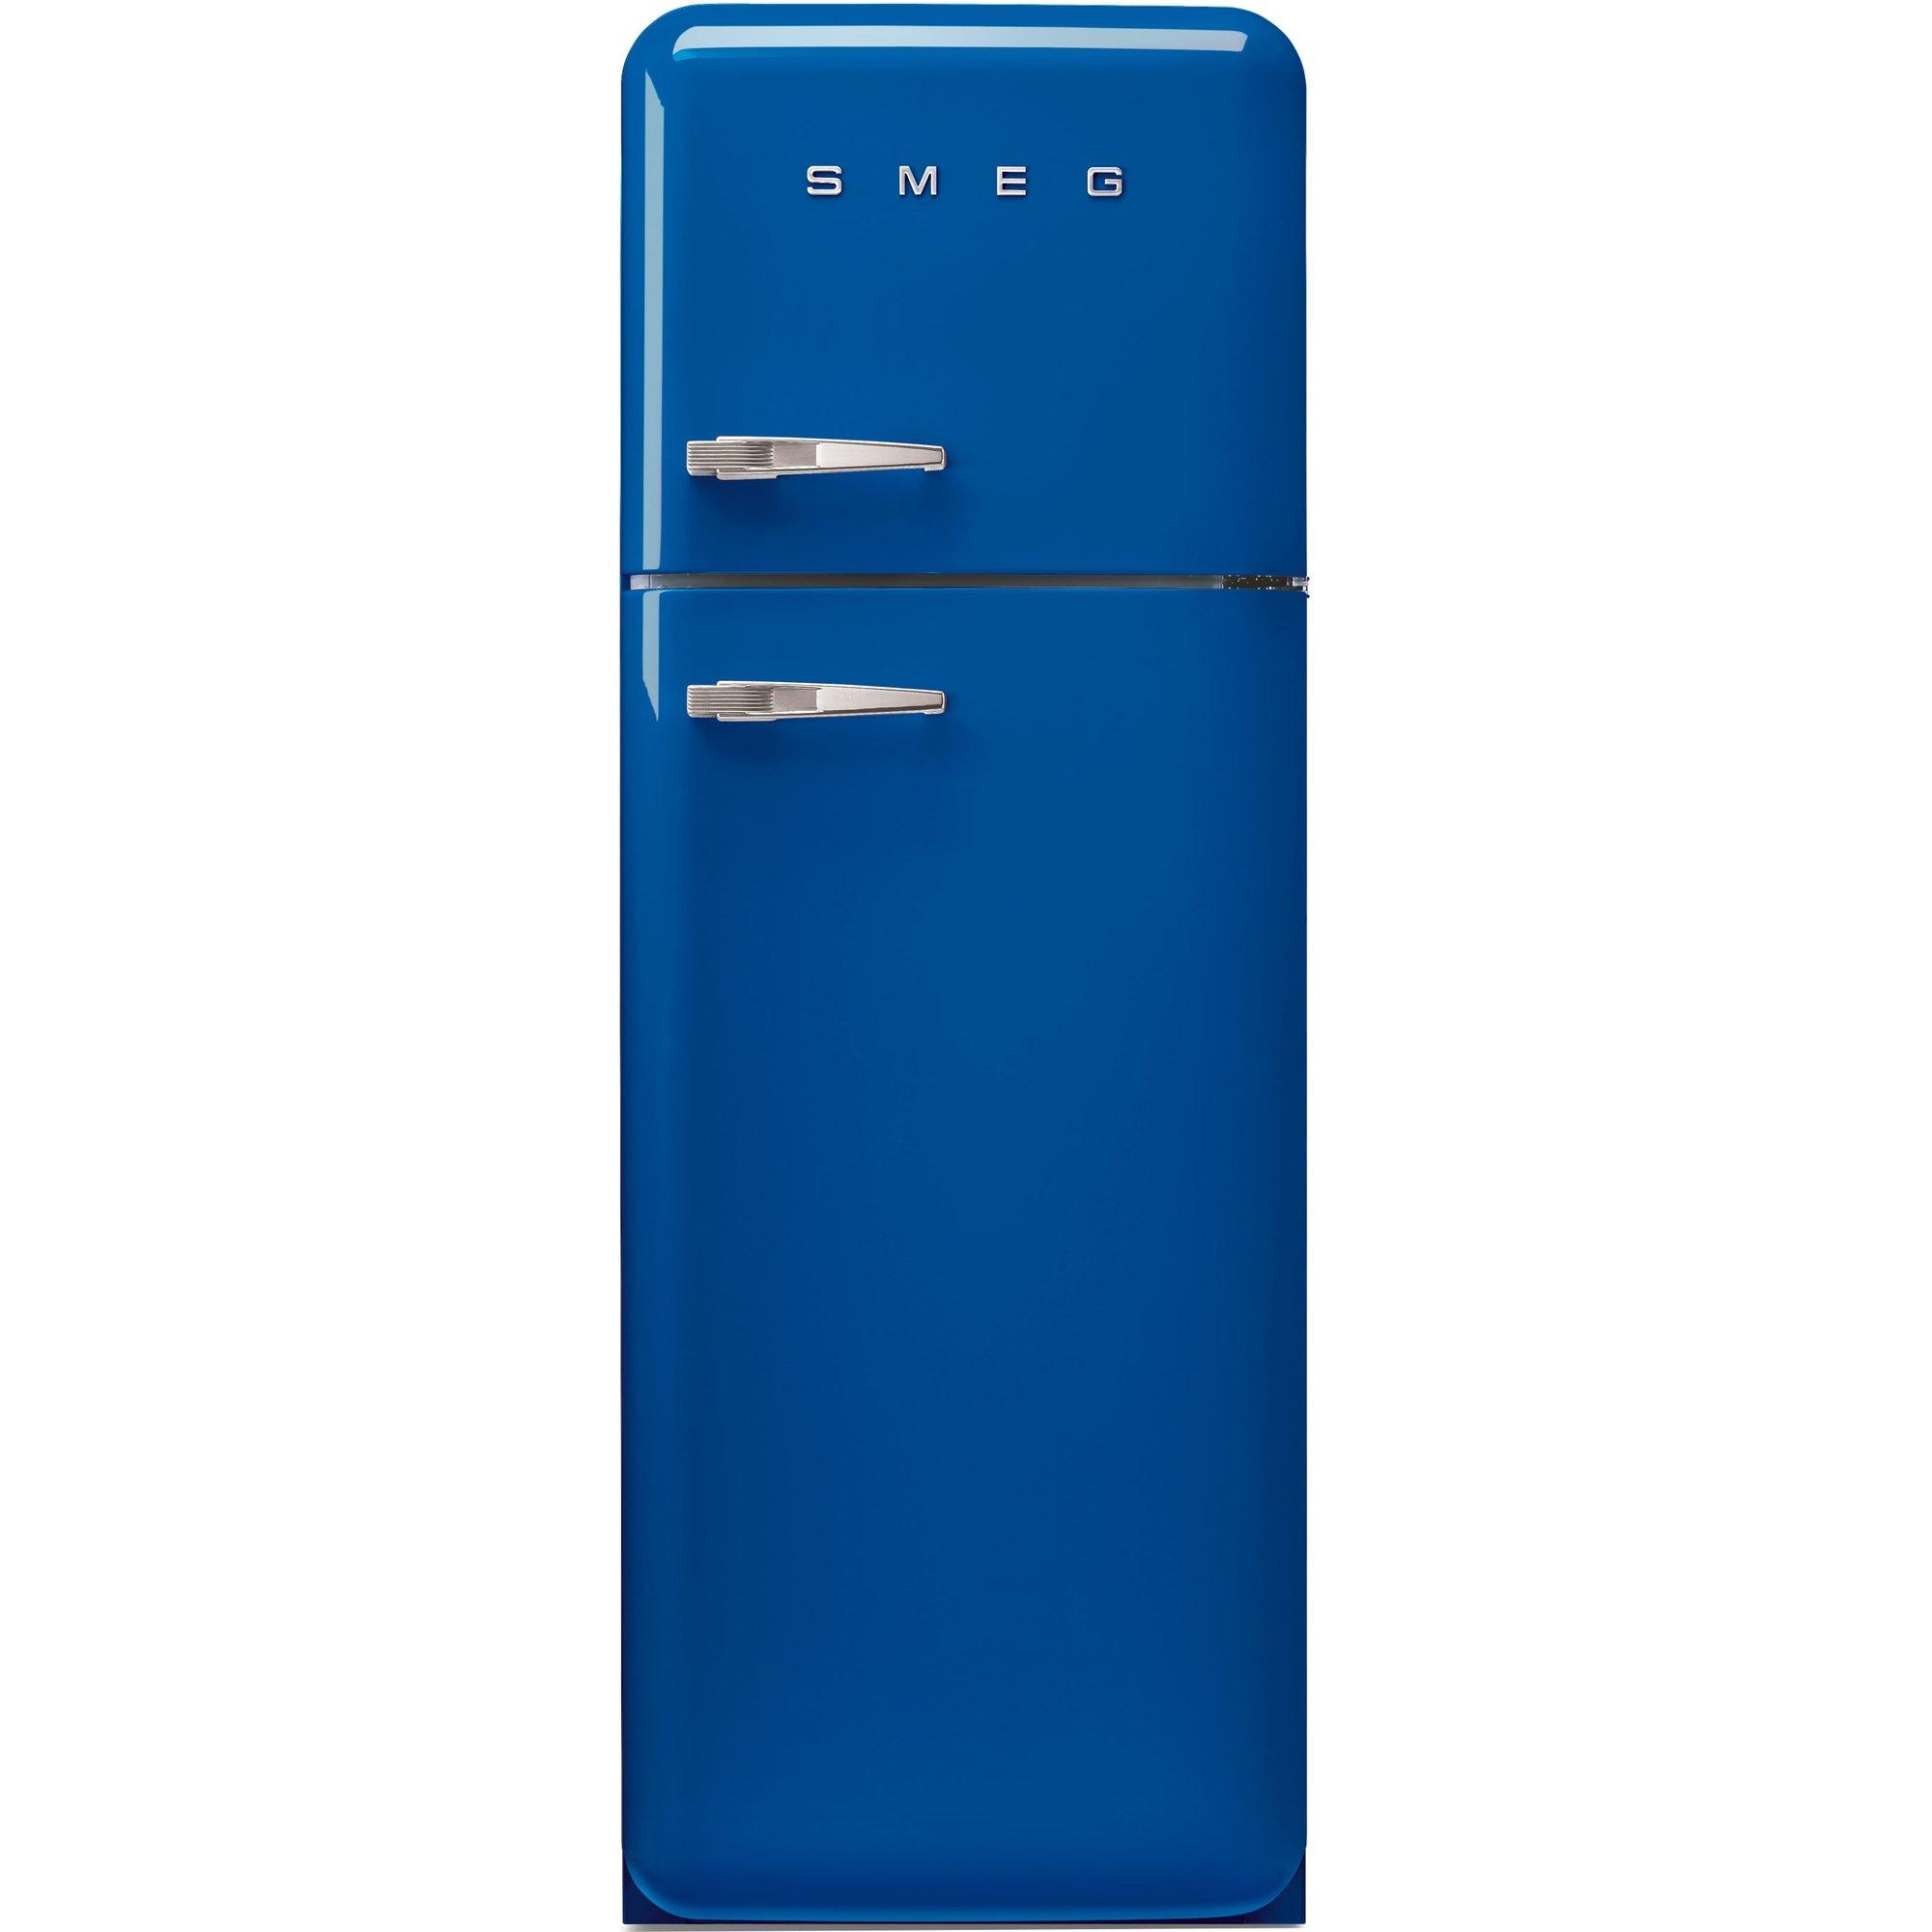 Smeg FAB30RBE5 Køle-/fryseskab blå